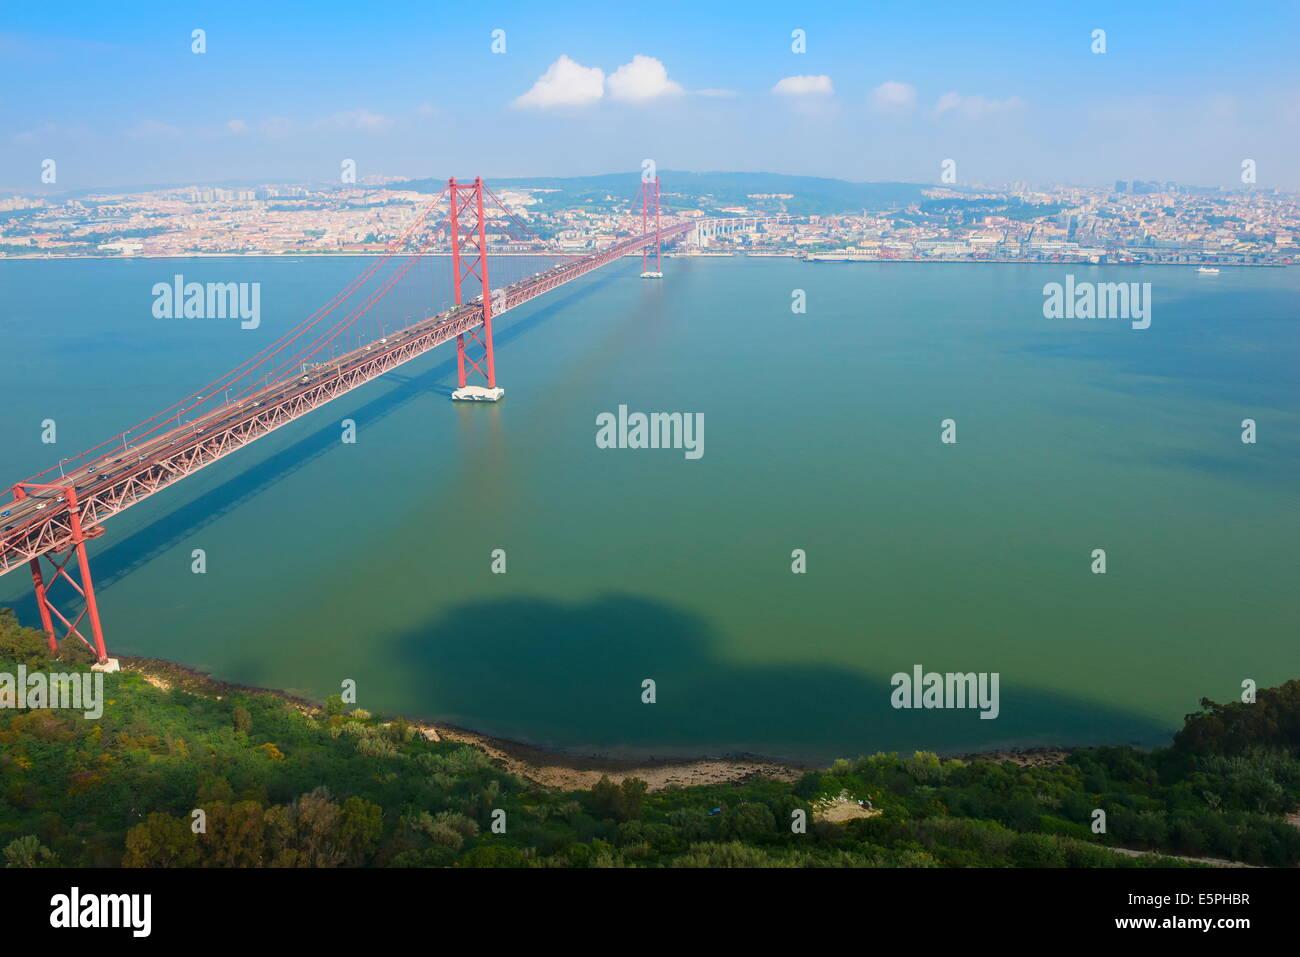 Ponte 25 de Abril (25th of April Bridge) over the Tagus River, Lisbon, Portugal, Europe Stock Photo